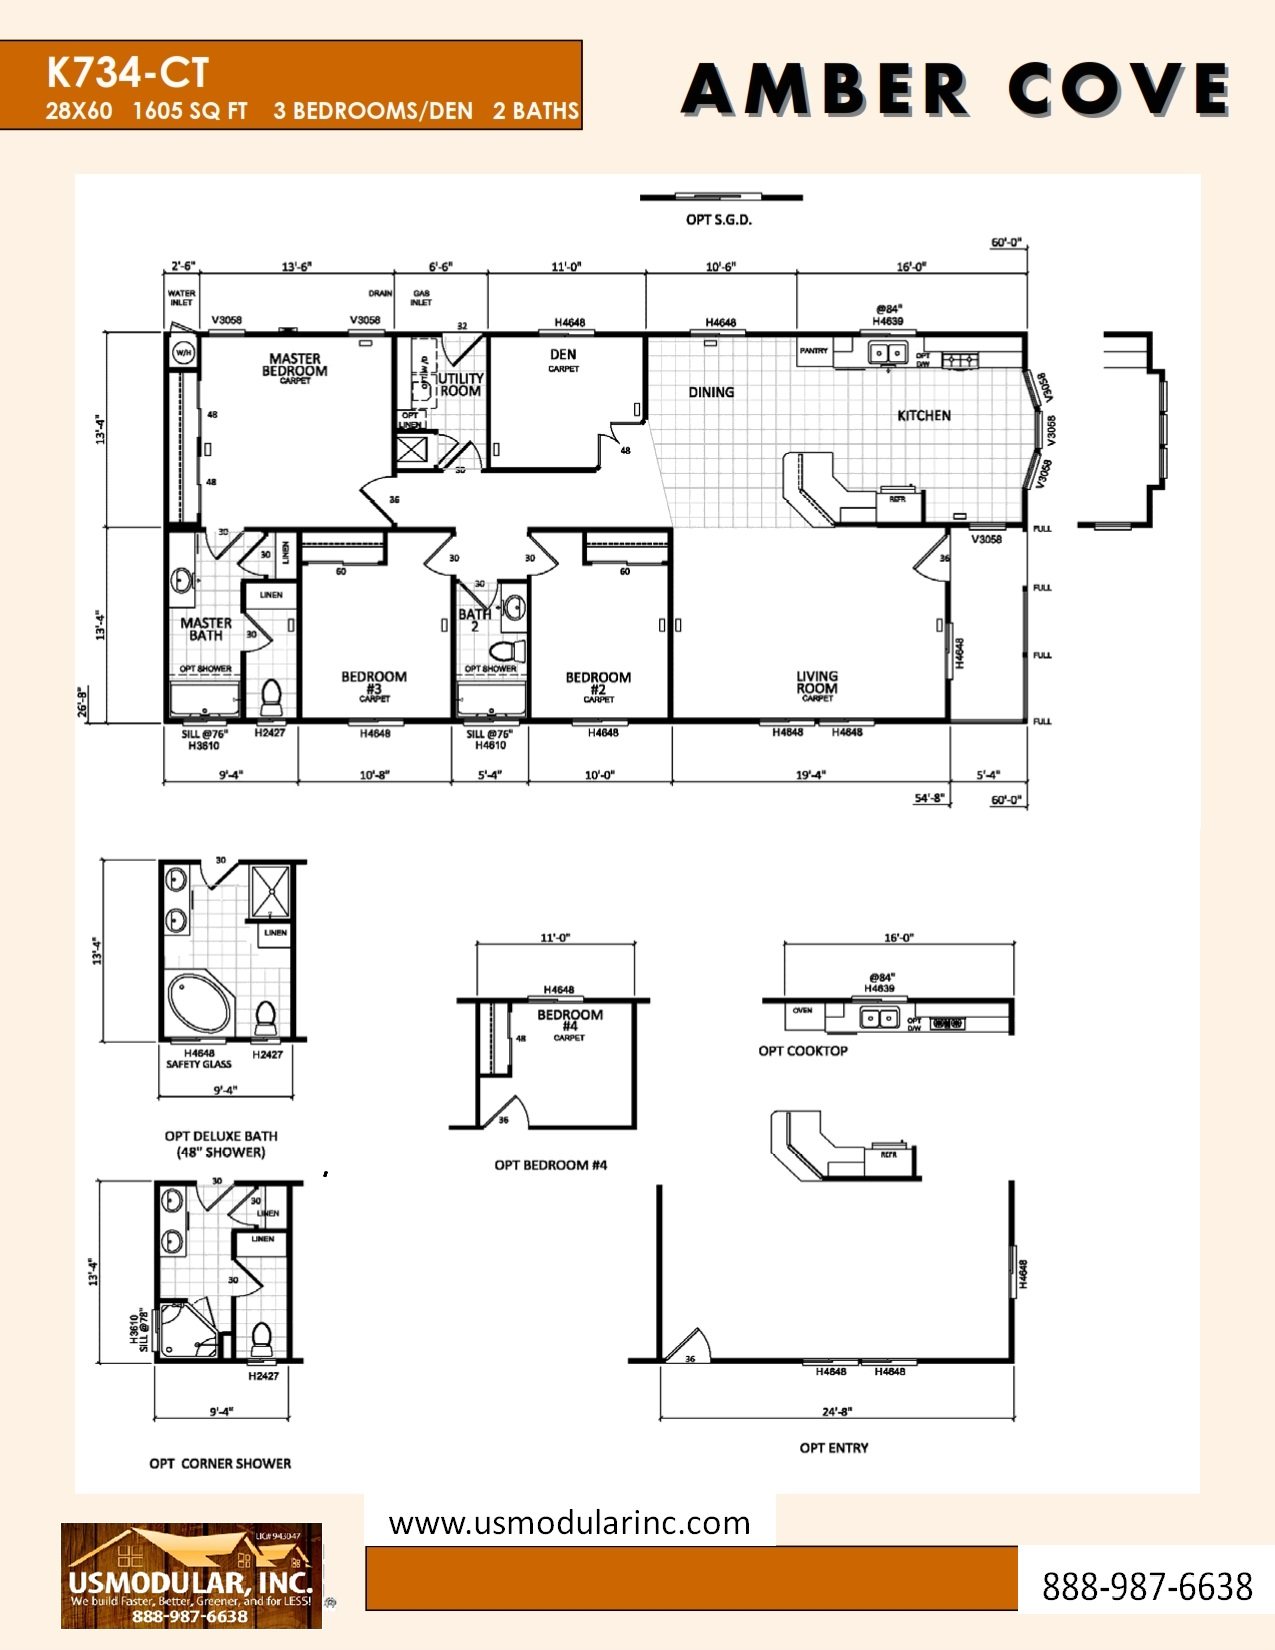 Pre designed floor plans usmodular inc modular home for Ready built homes floor plans